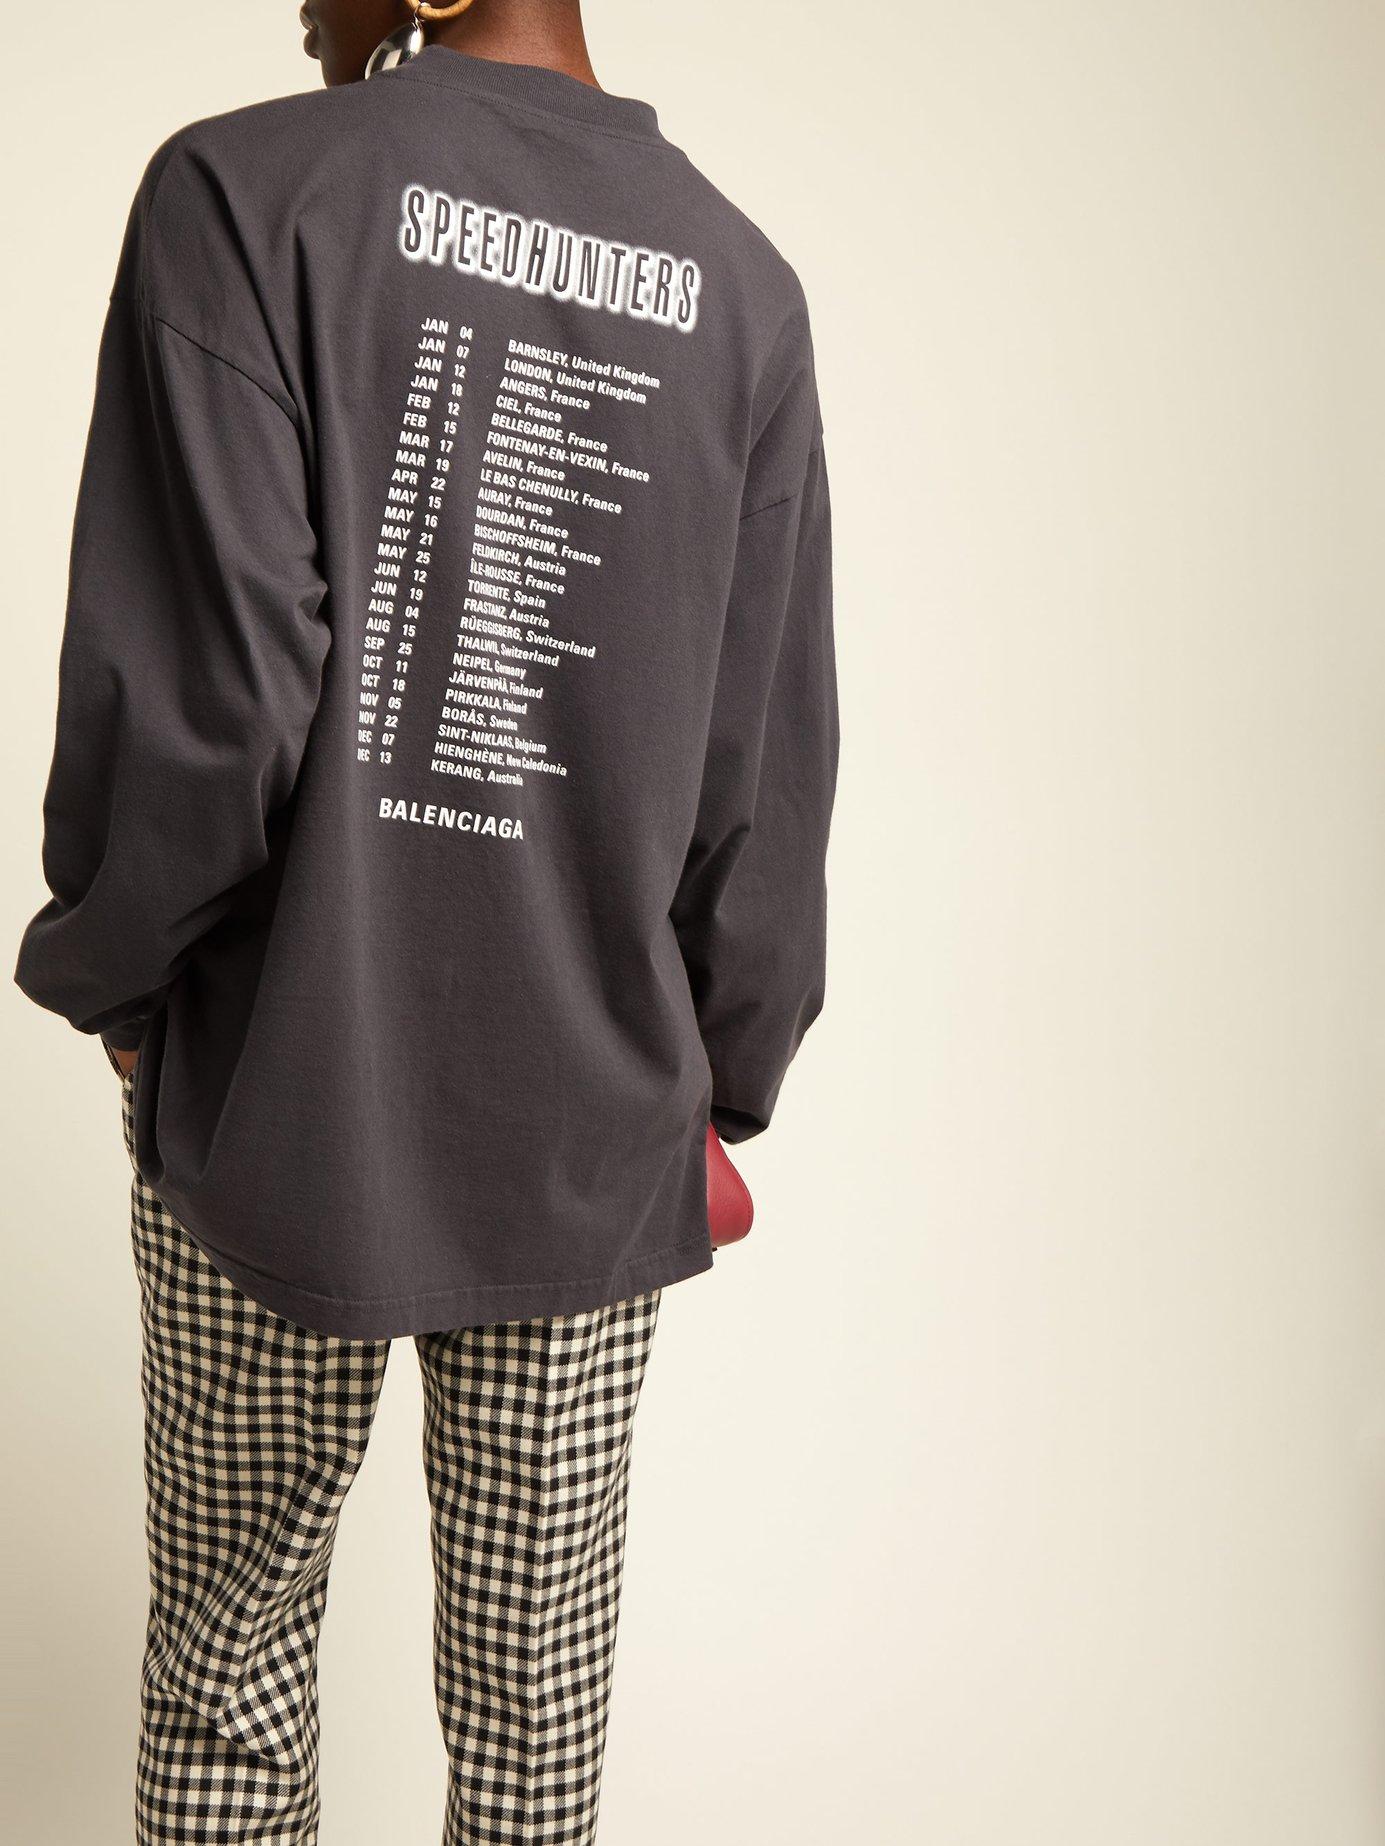 Speedhunters cotton long-sleeve T-shirt by Balenciaga